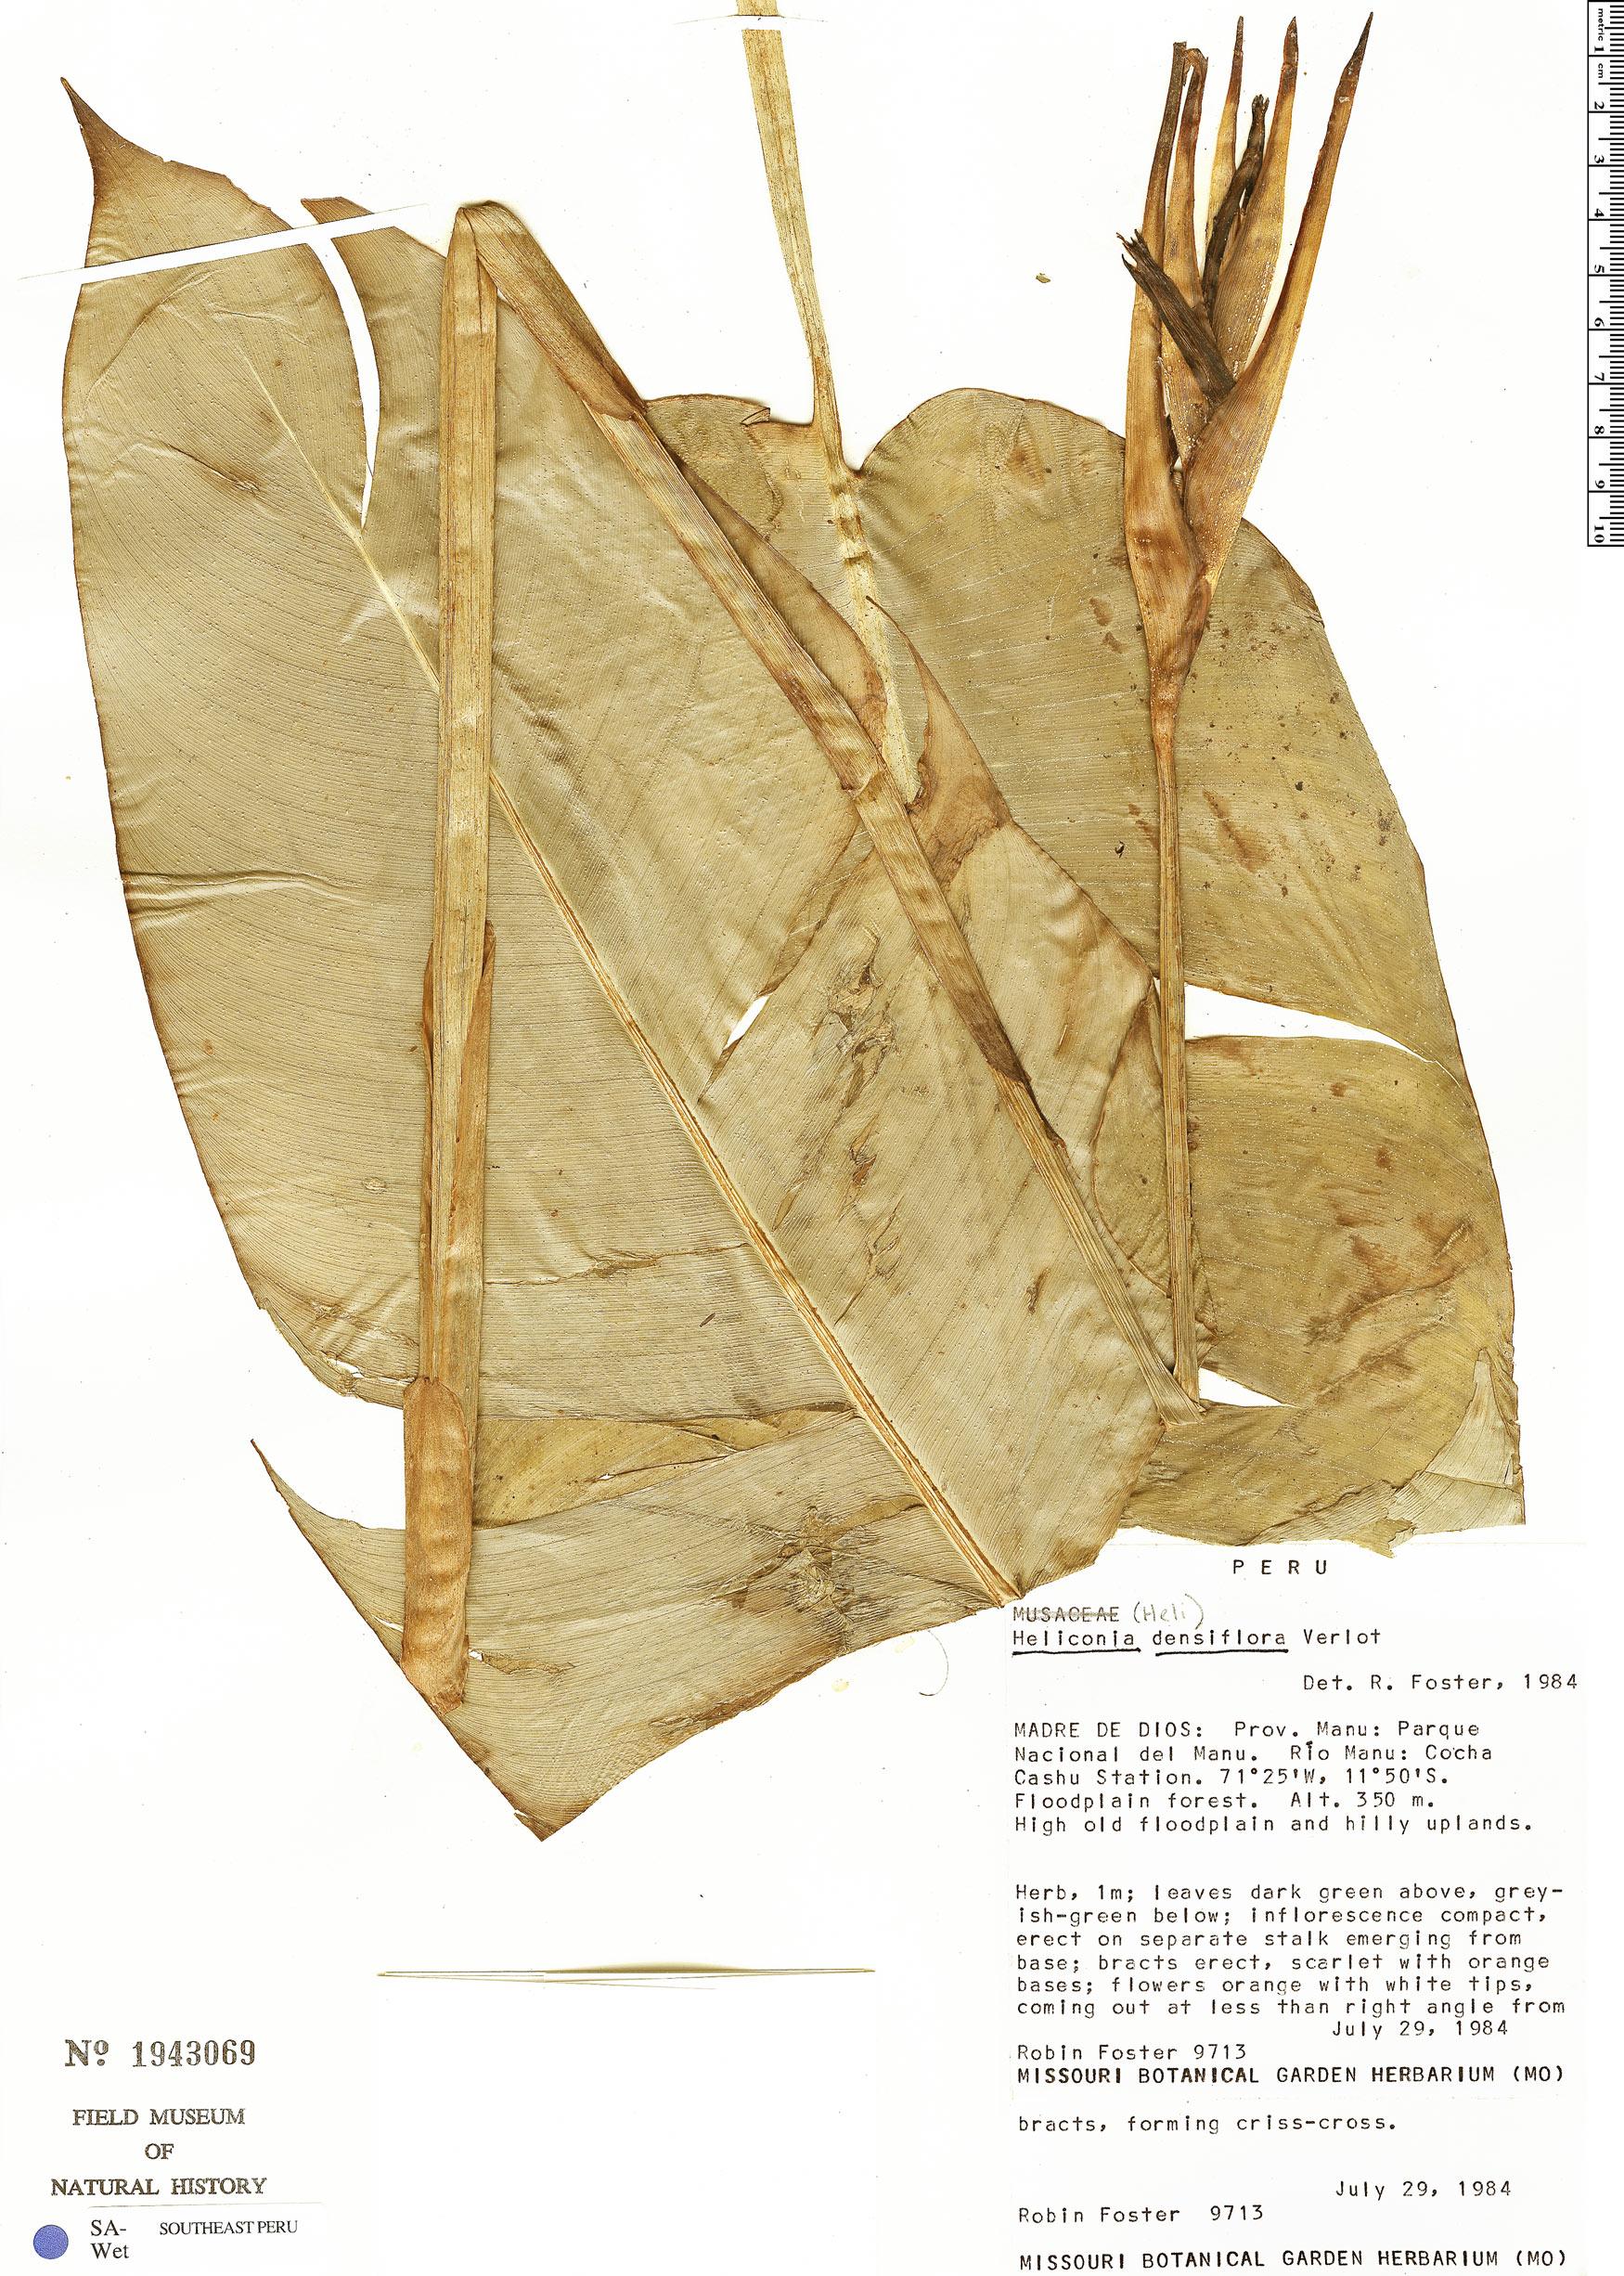 Specimen: Heliconia densiflora